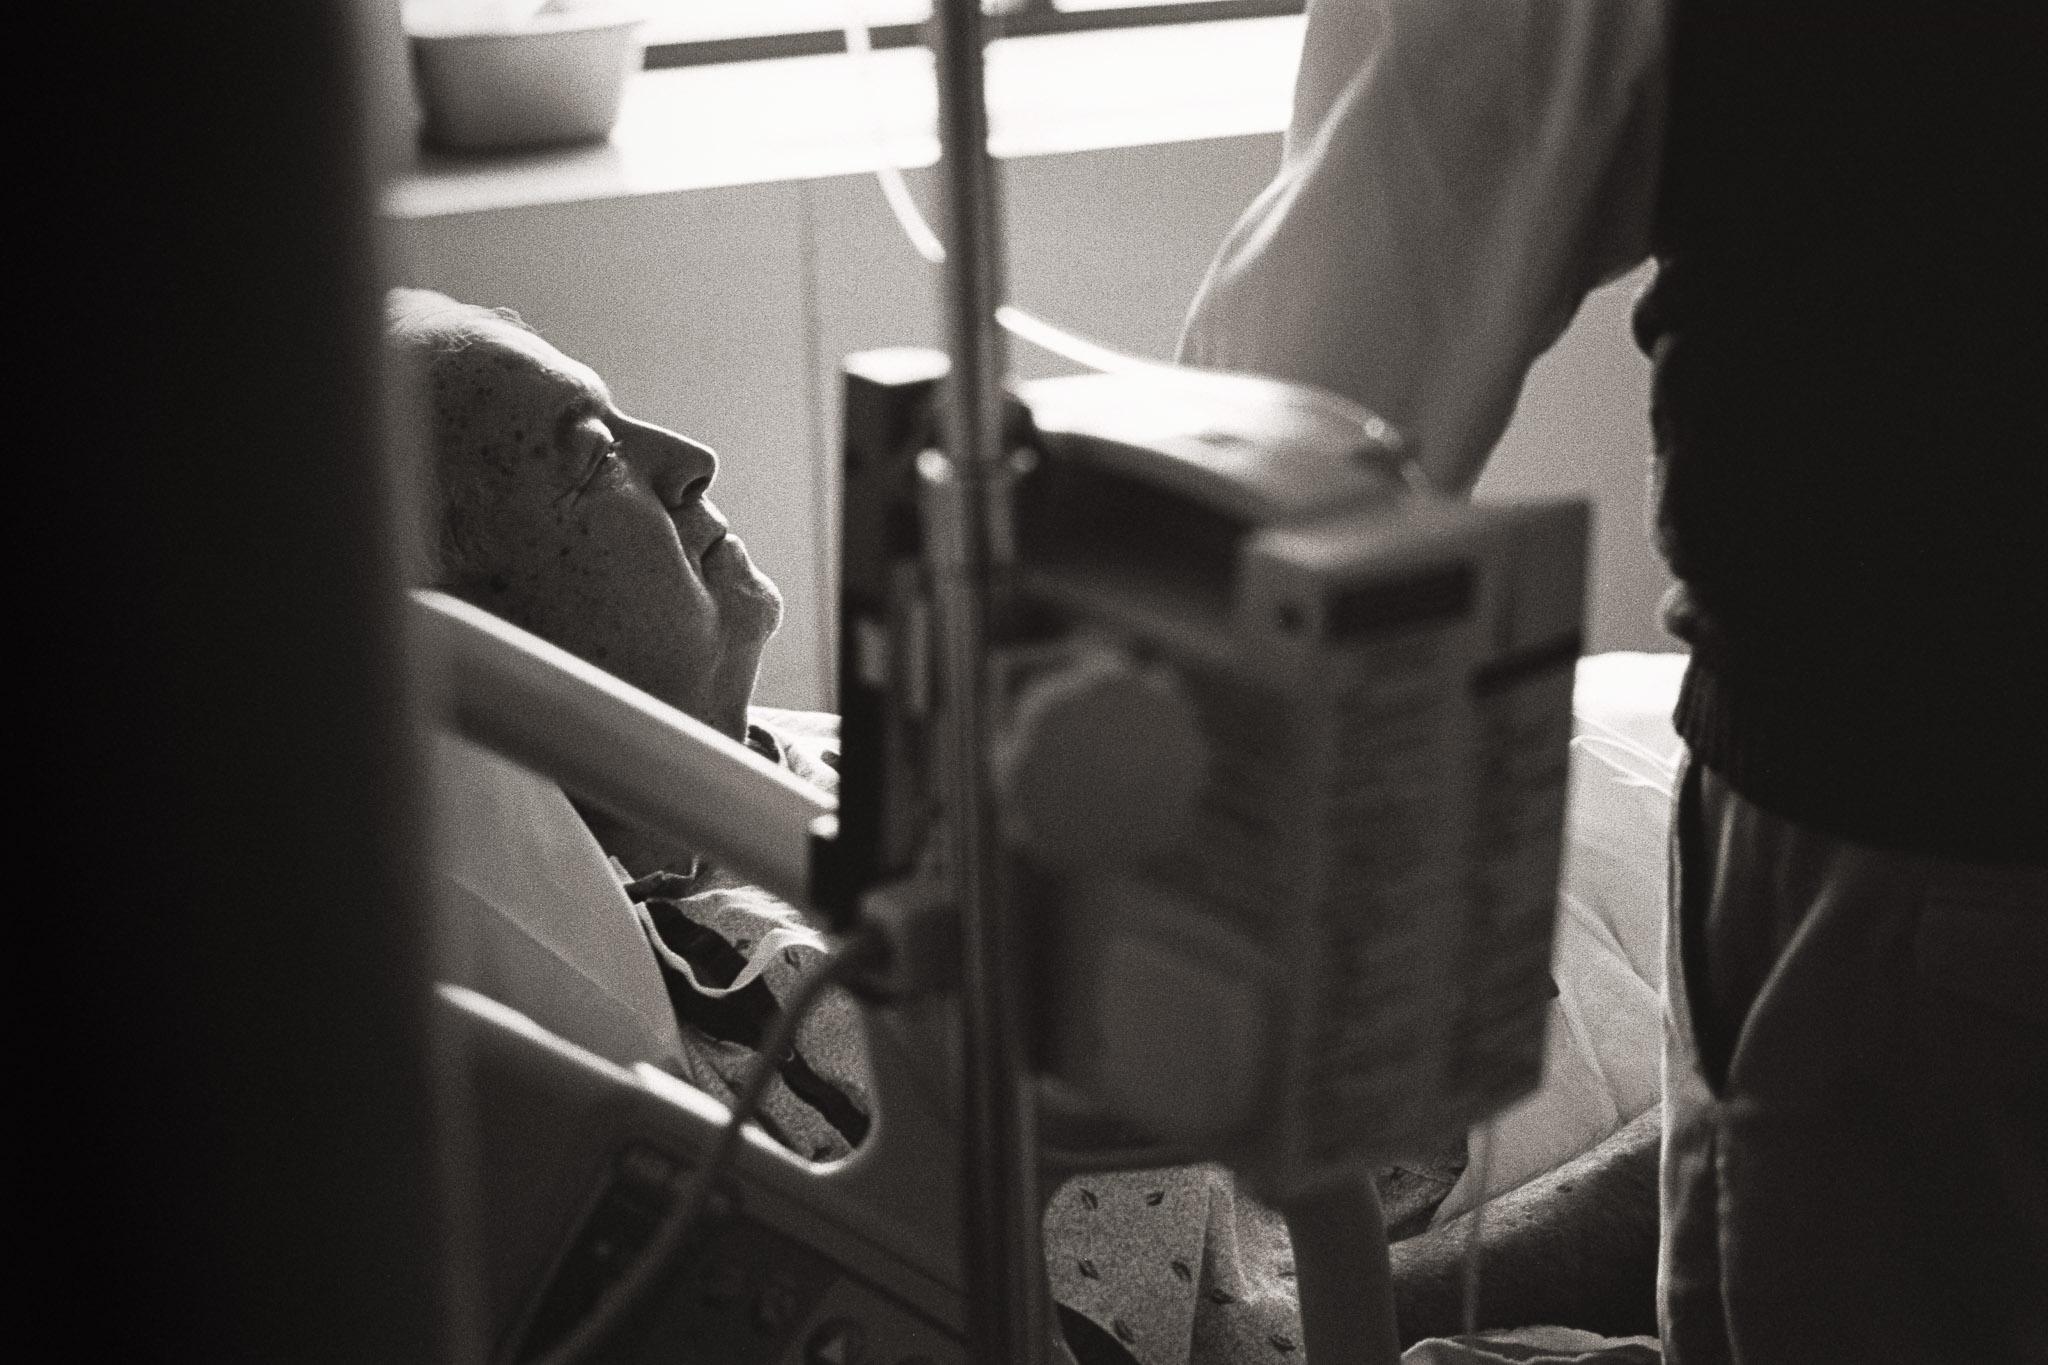 hospital_Lomanno_1371_AB028.jpg